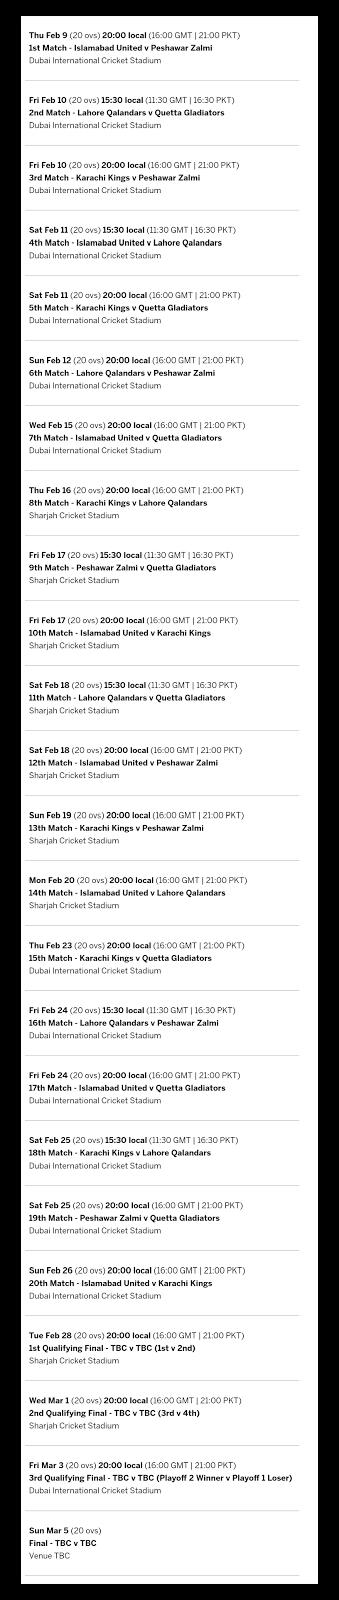 Psl Live Streaming Hd Live Stream Pakistan Super League 2017 For Outside Pakistan